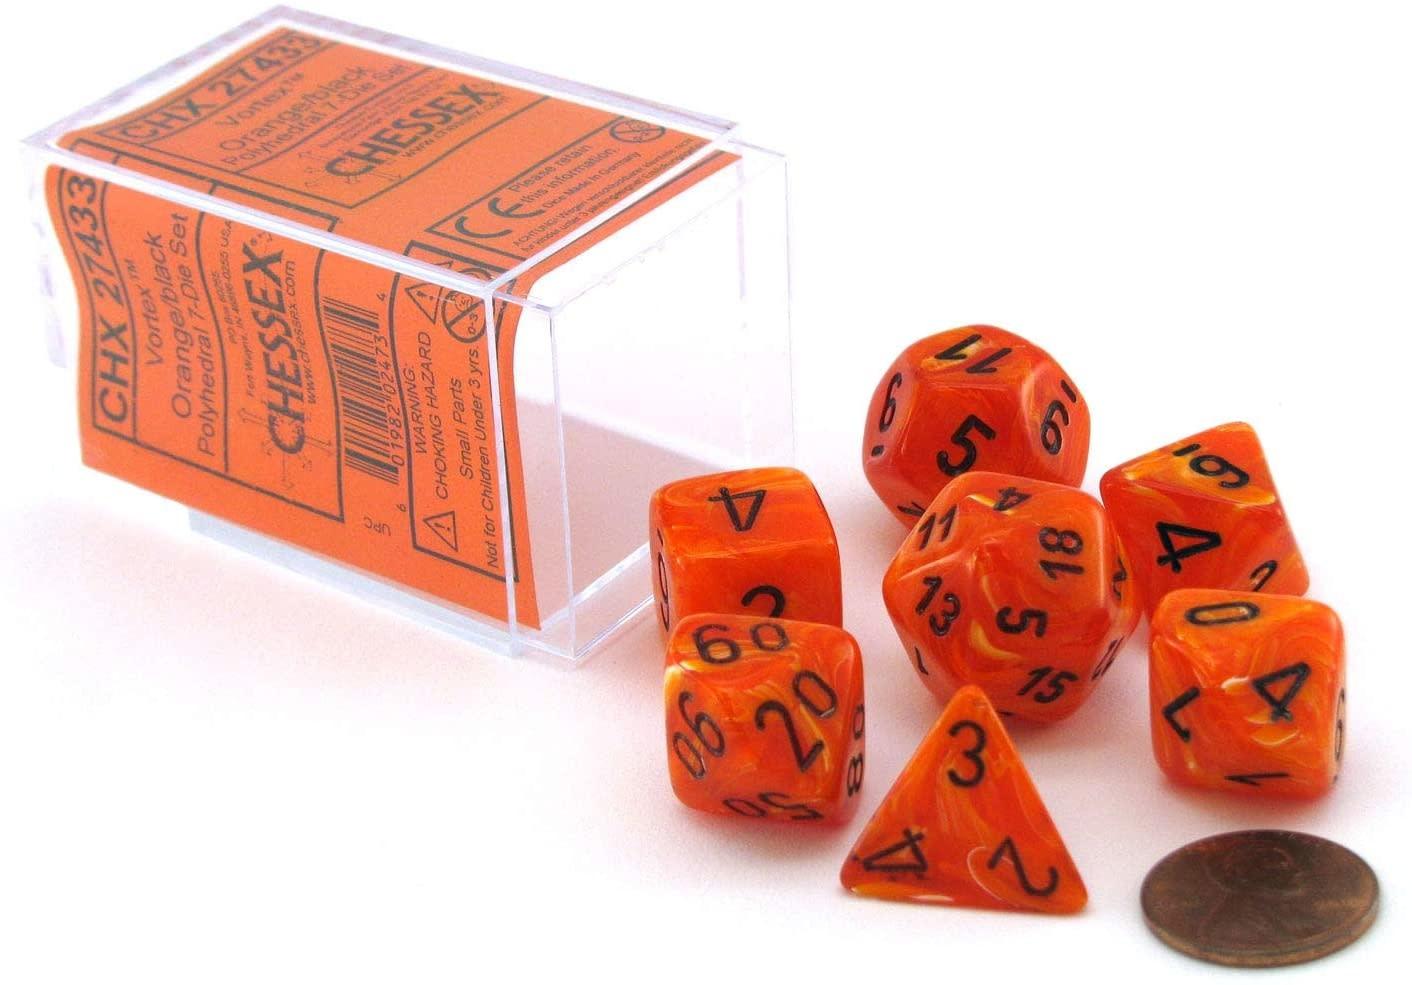 Chessex: Opaque Orange With Black Sets